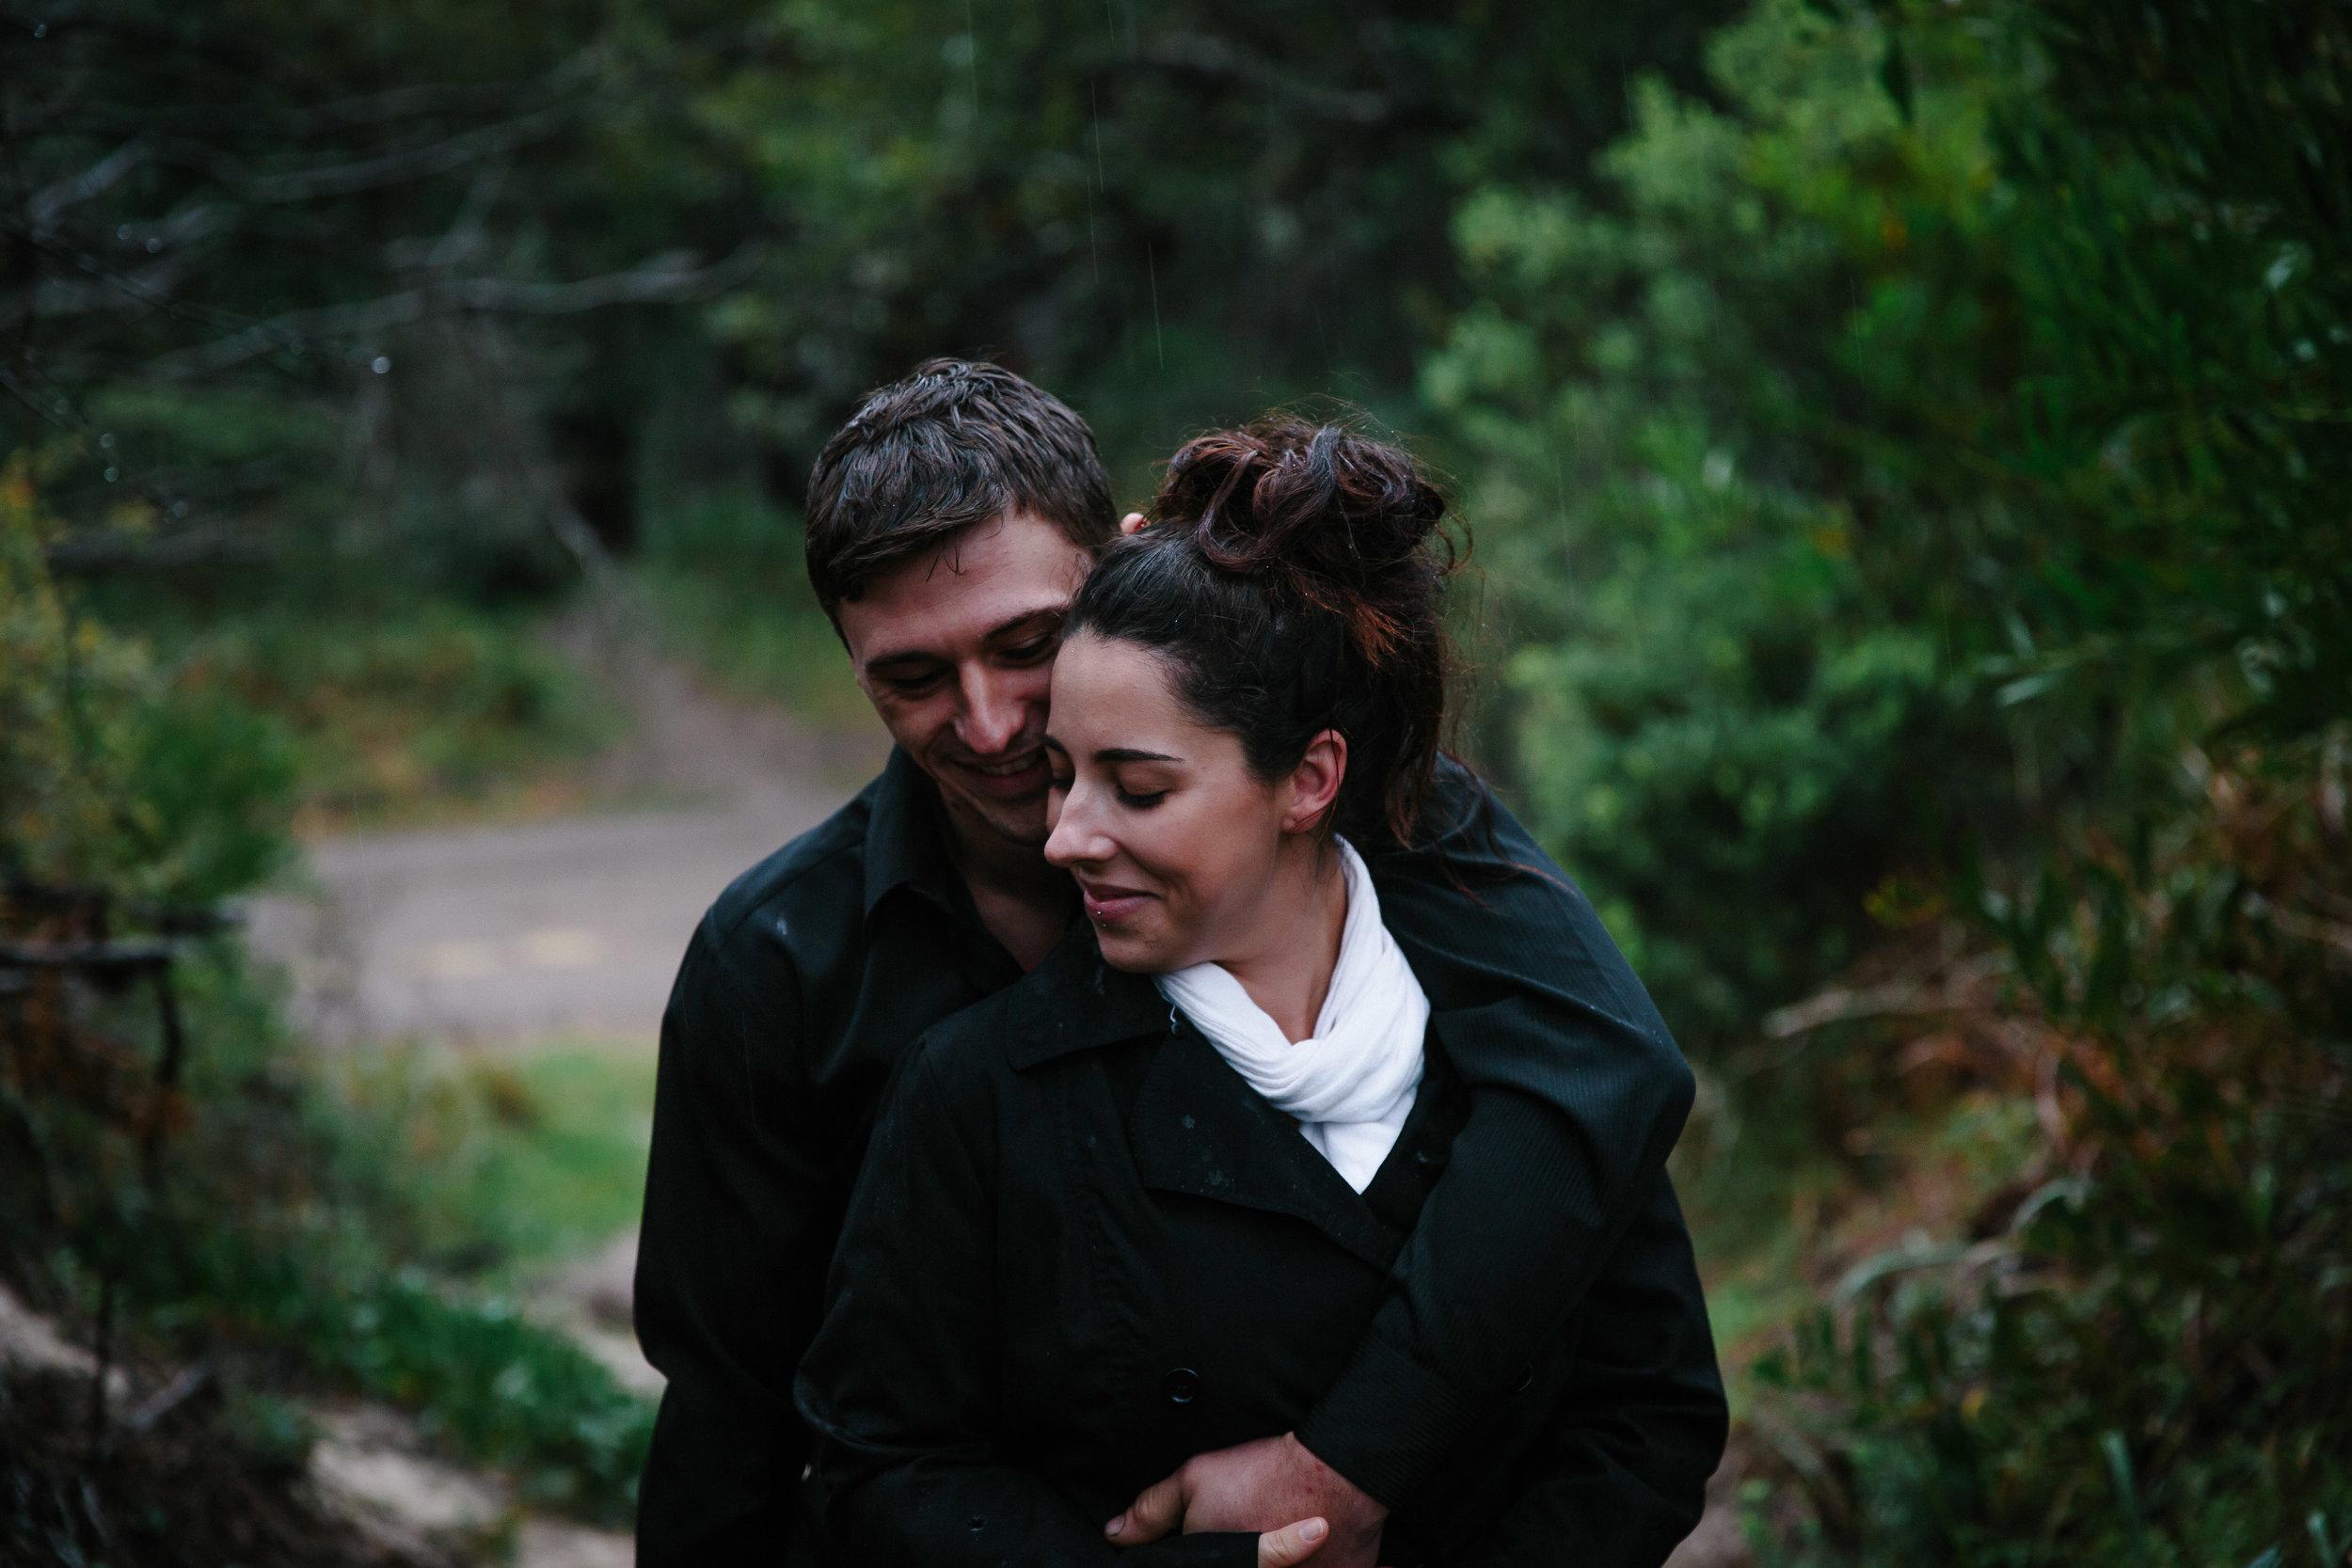 Lachlan Jordan Photography Hawks Nest Engagement